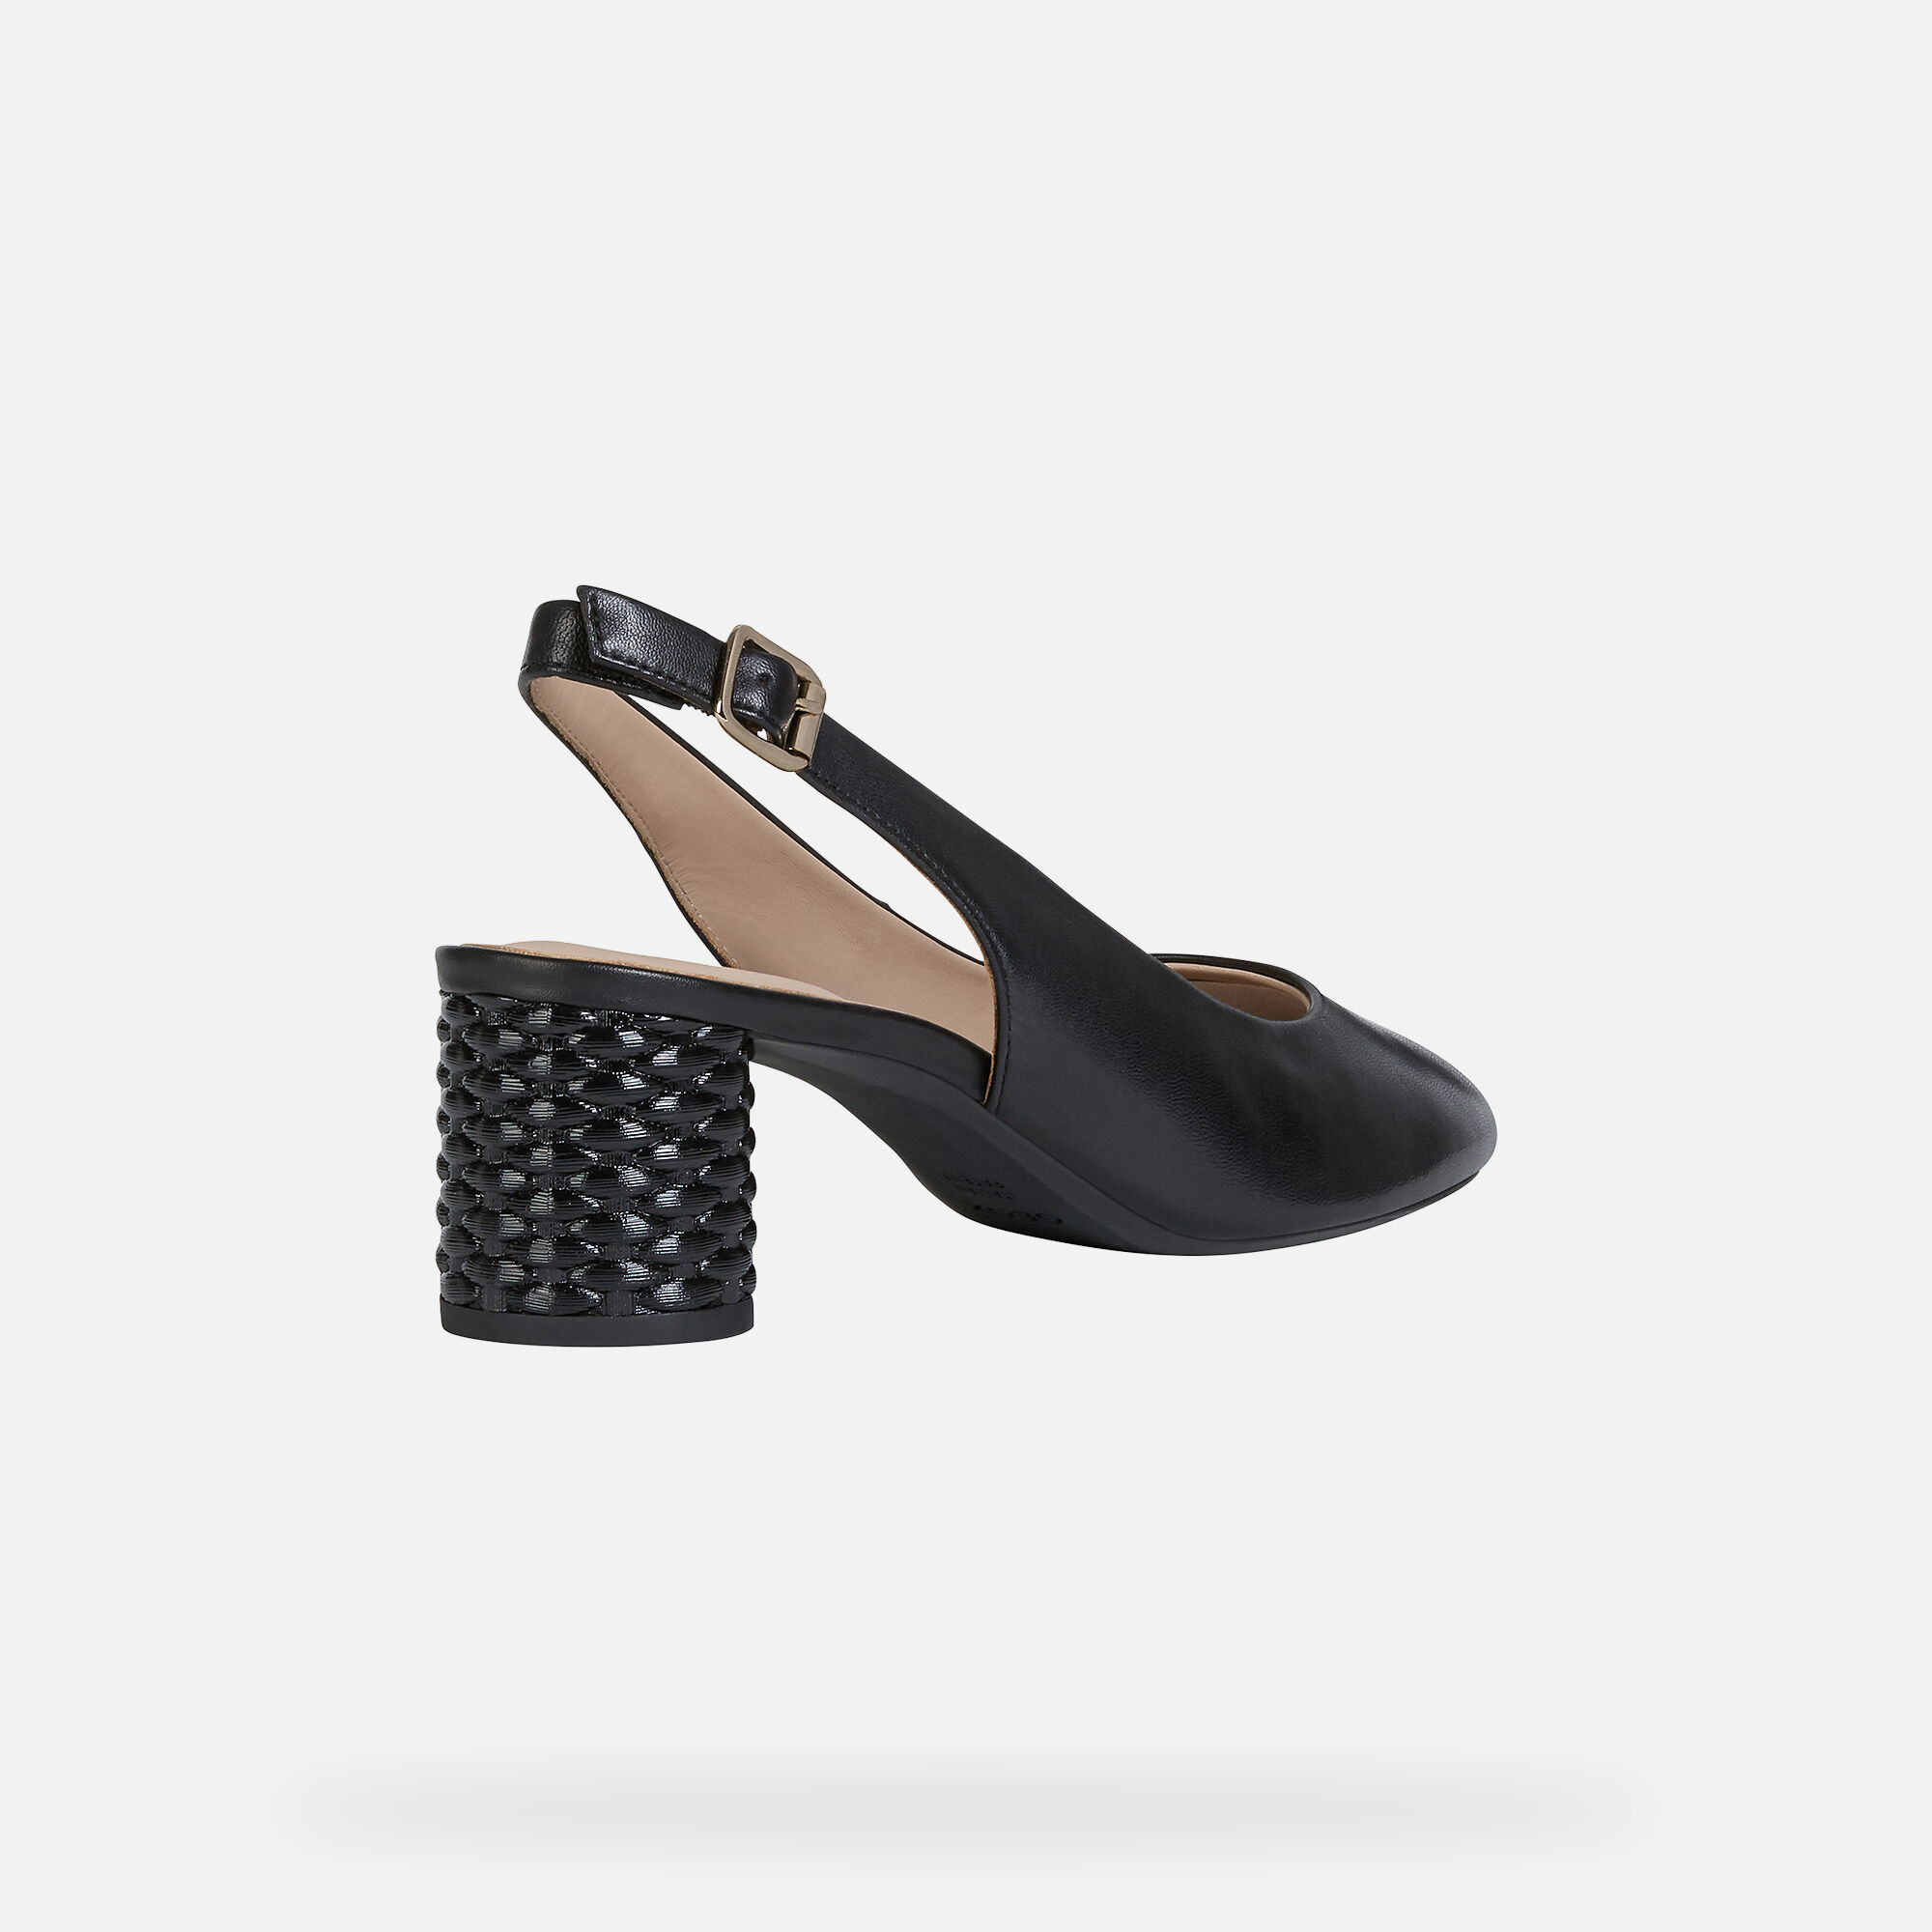 Geox ORTENSIA Woman Shoes | Geox